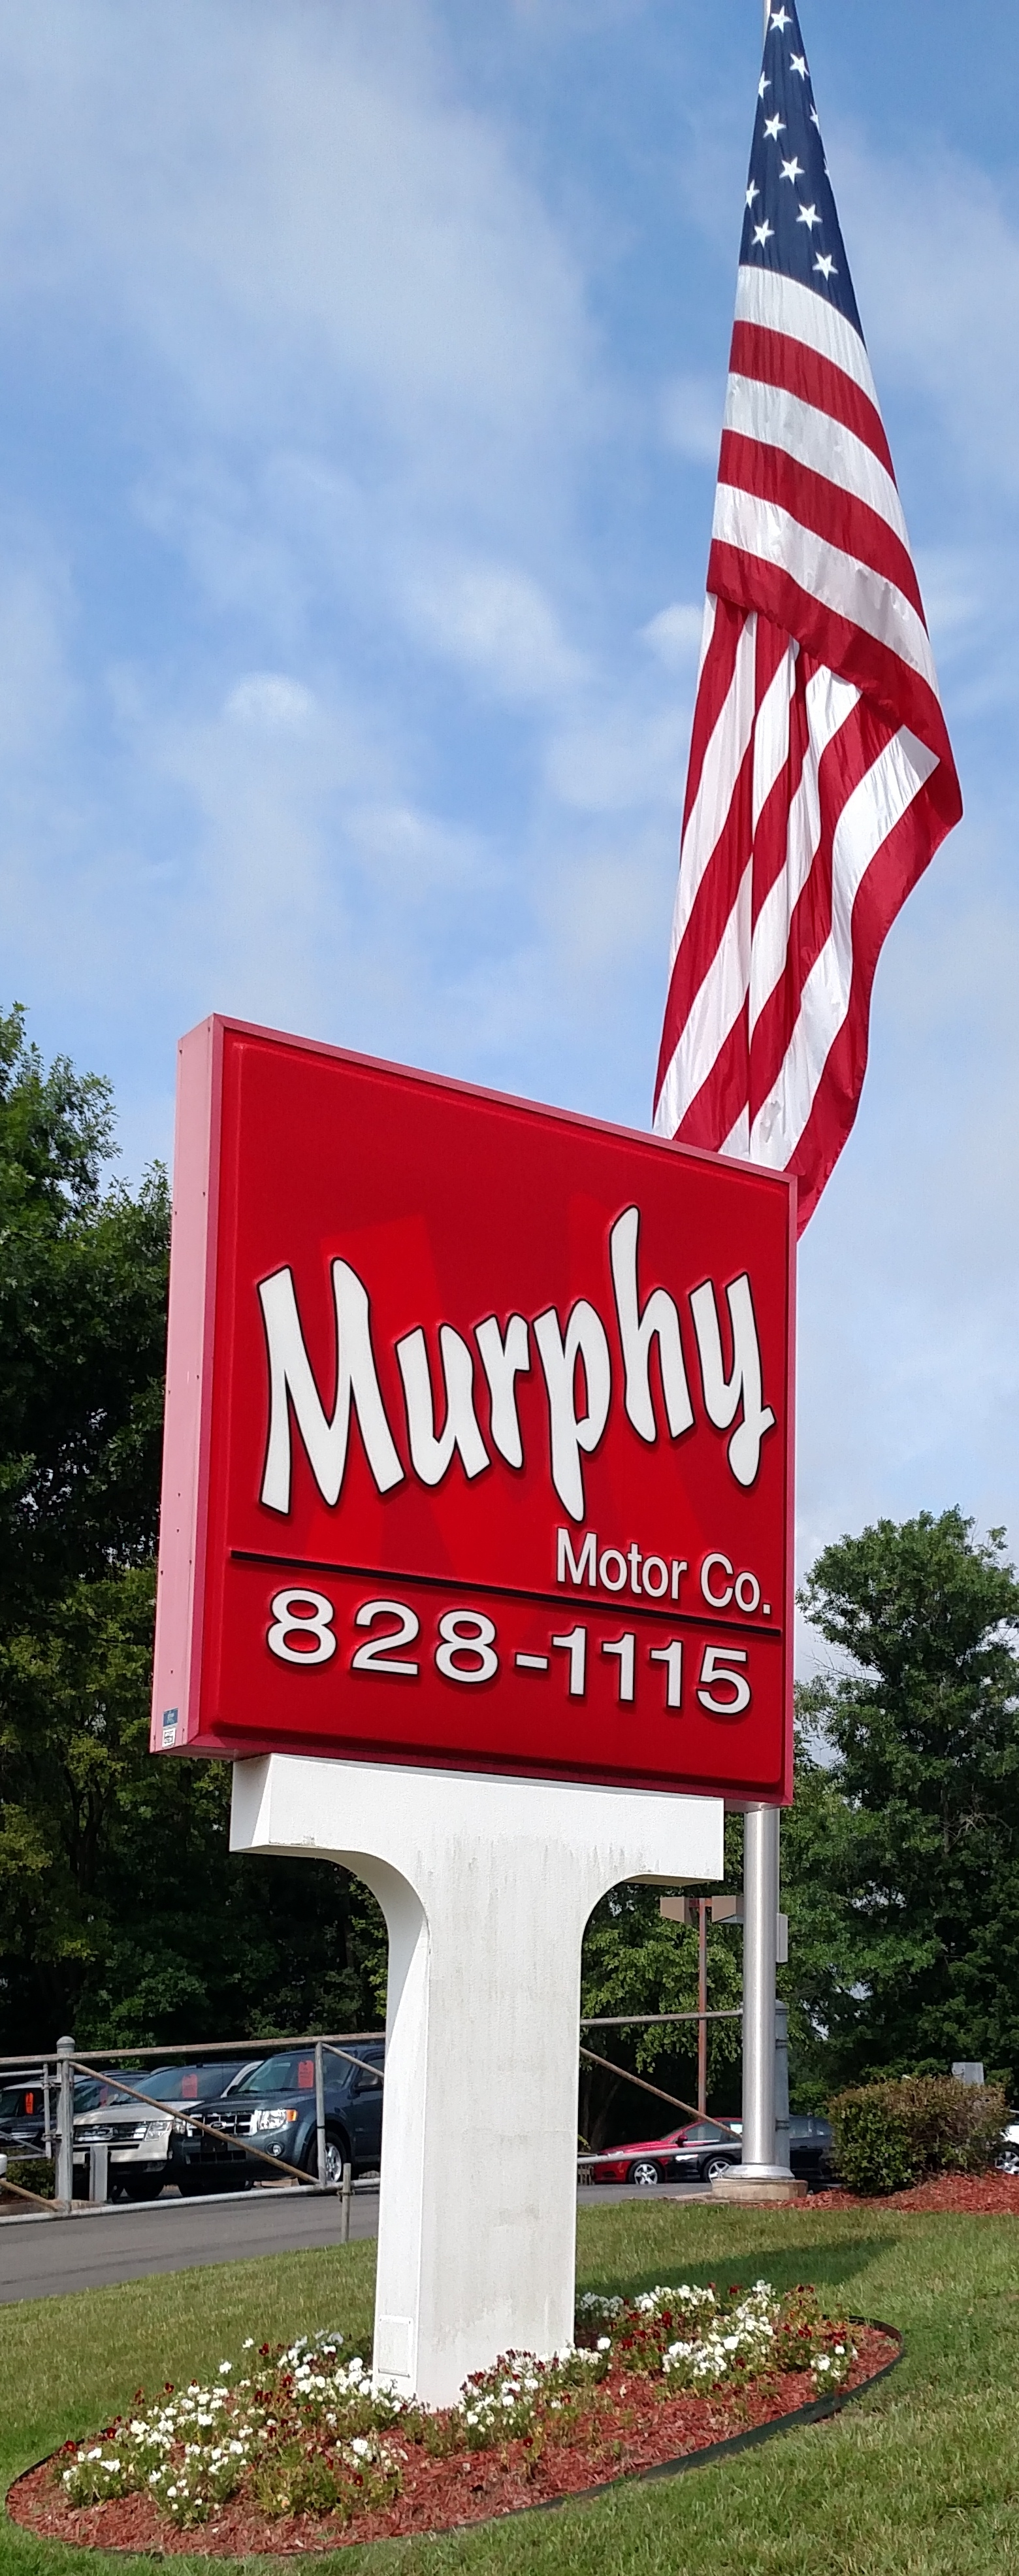 Murphy Motor Company In Raleigh Nc 919 828 1